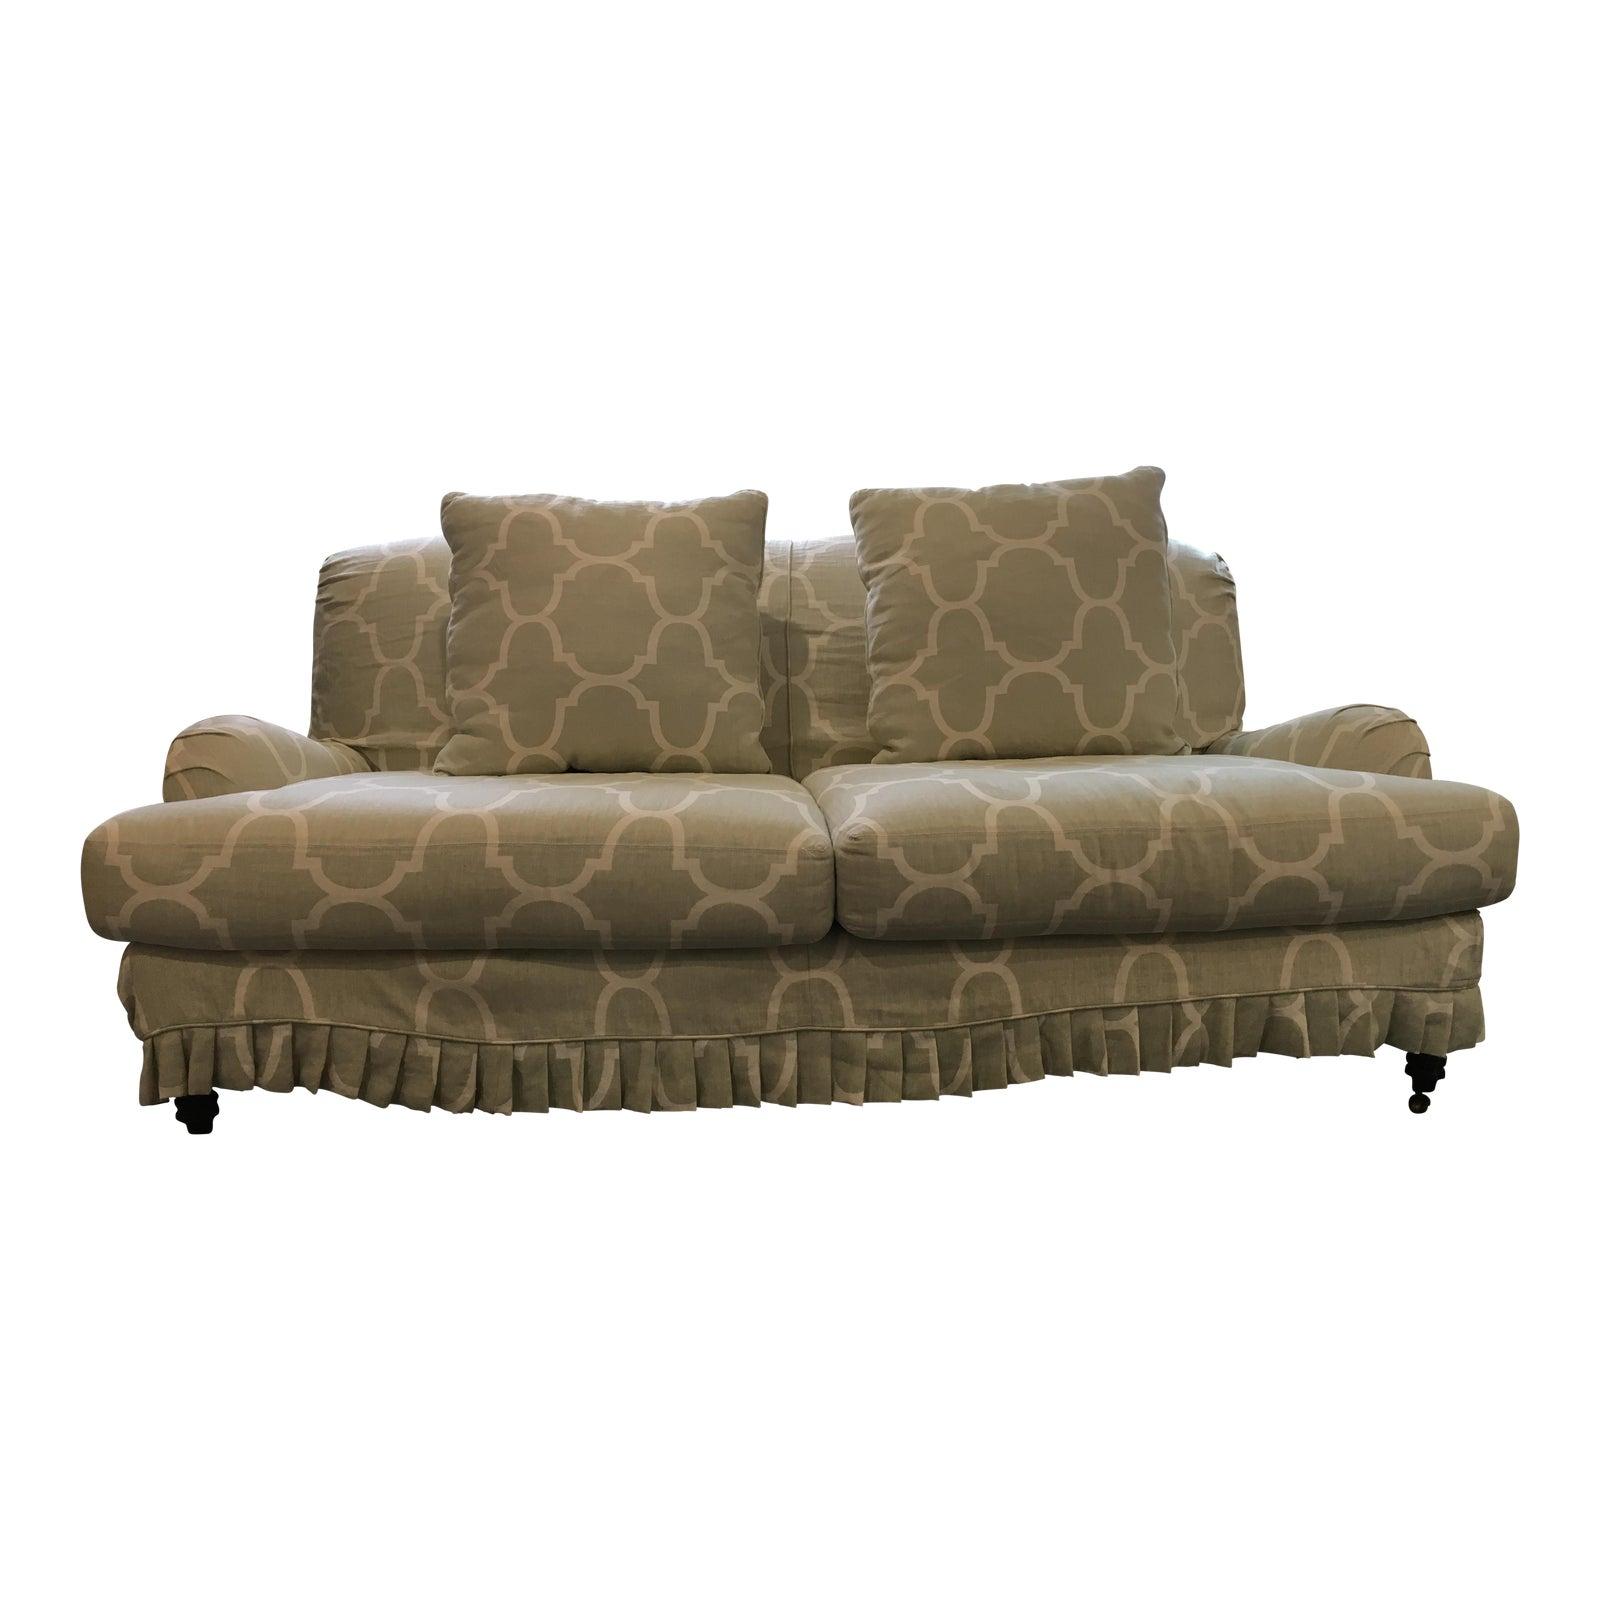 Lee Industries Seafoam Green Linen Windsor Smith Slipcovered Sofa